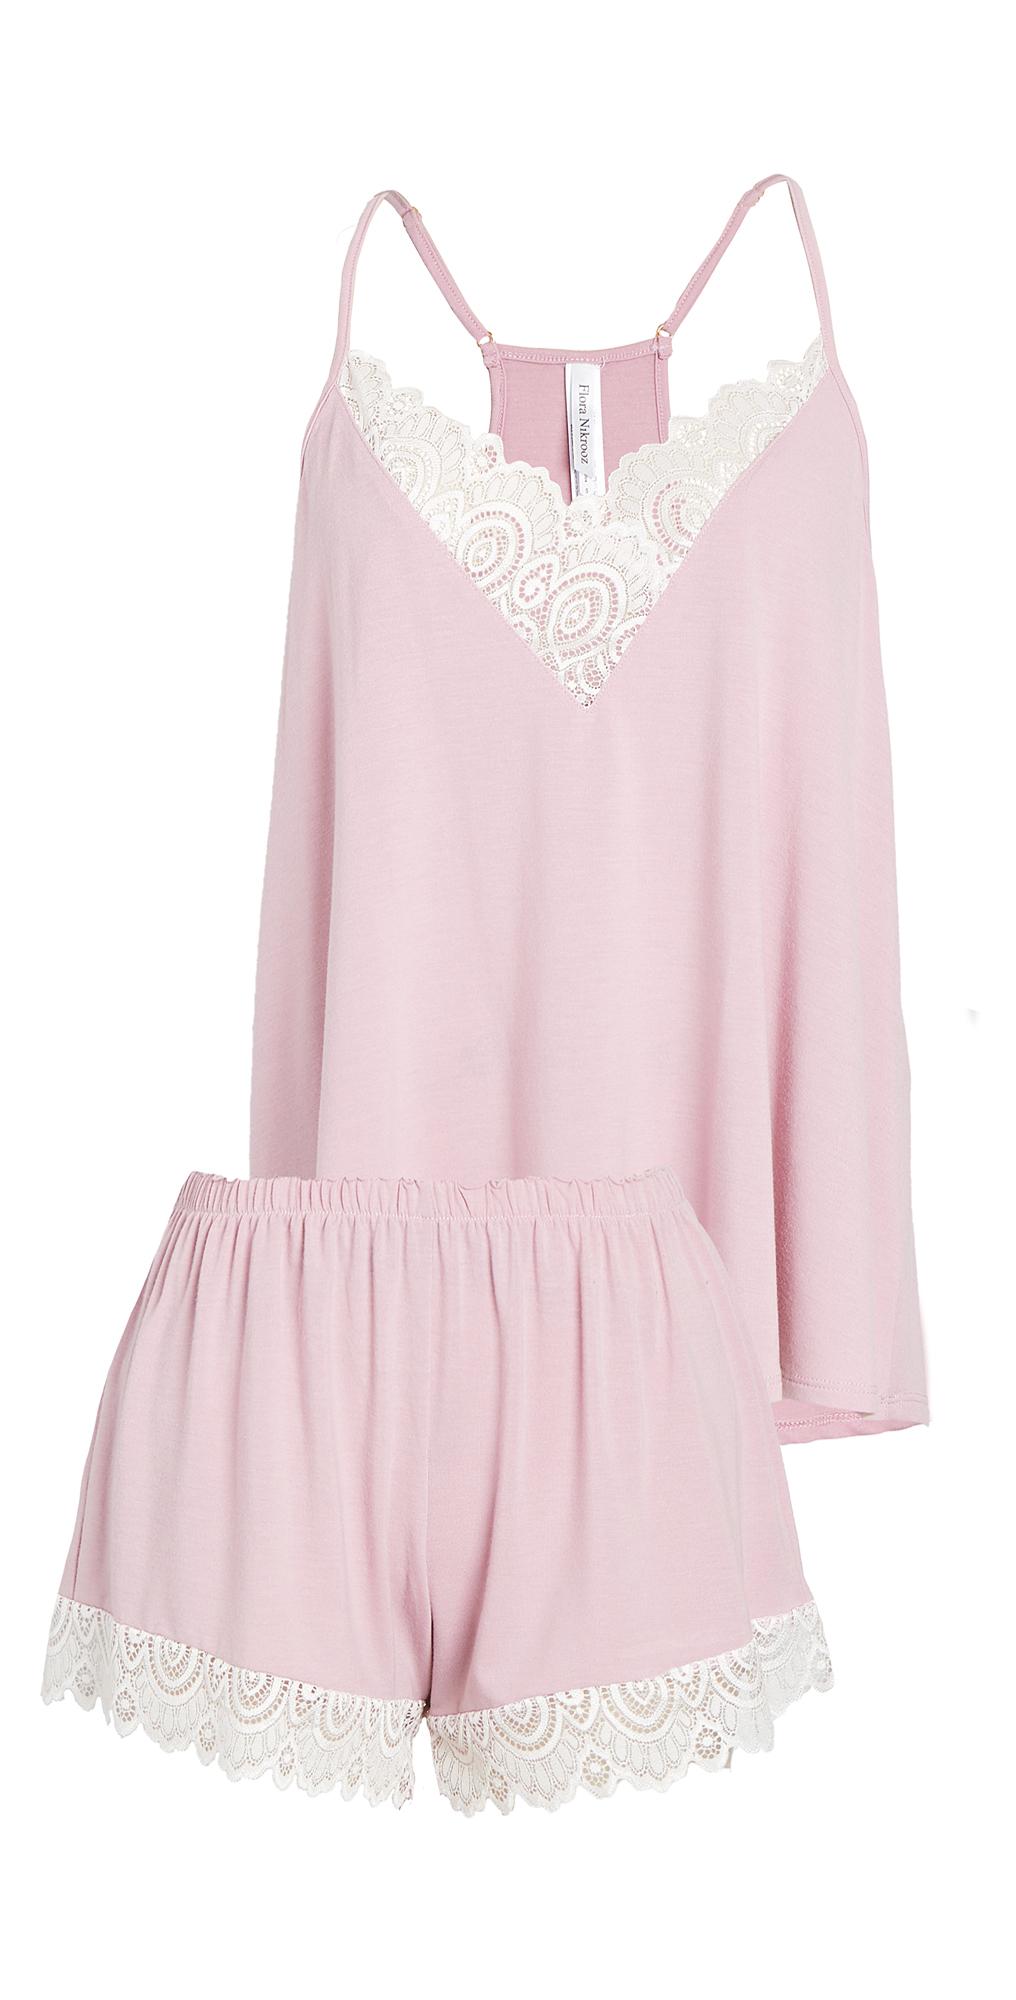 Floretta II Knit Cami Pajama Set with Lace Trim